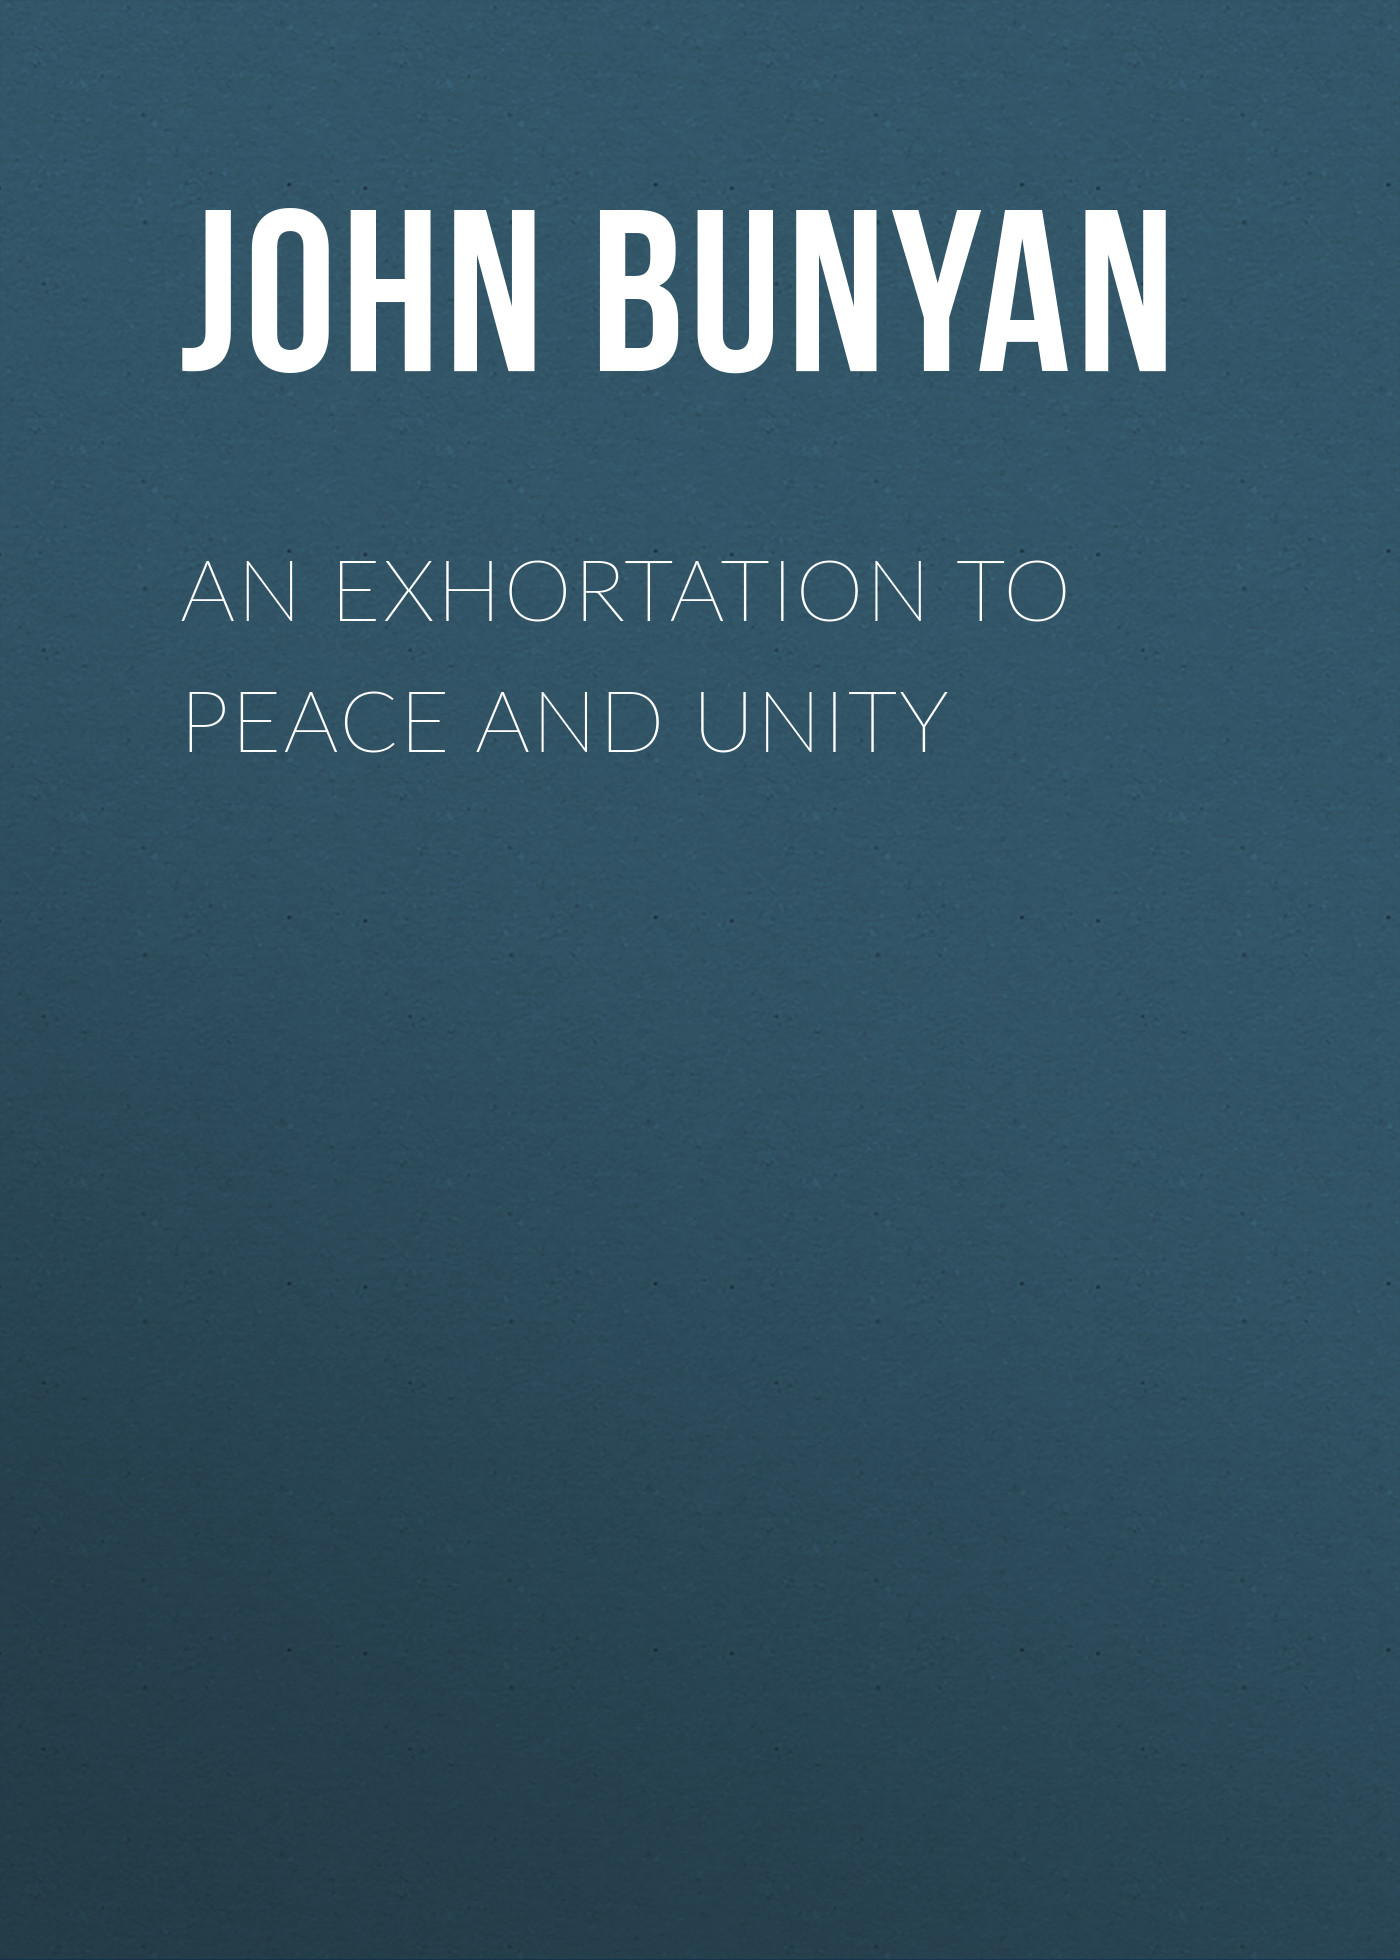 лучшая цена John Bunyan An Exhortation to Peace and Unity